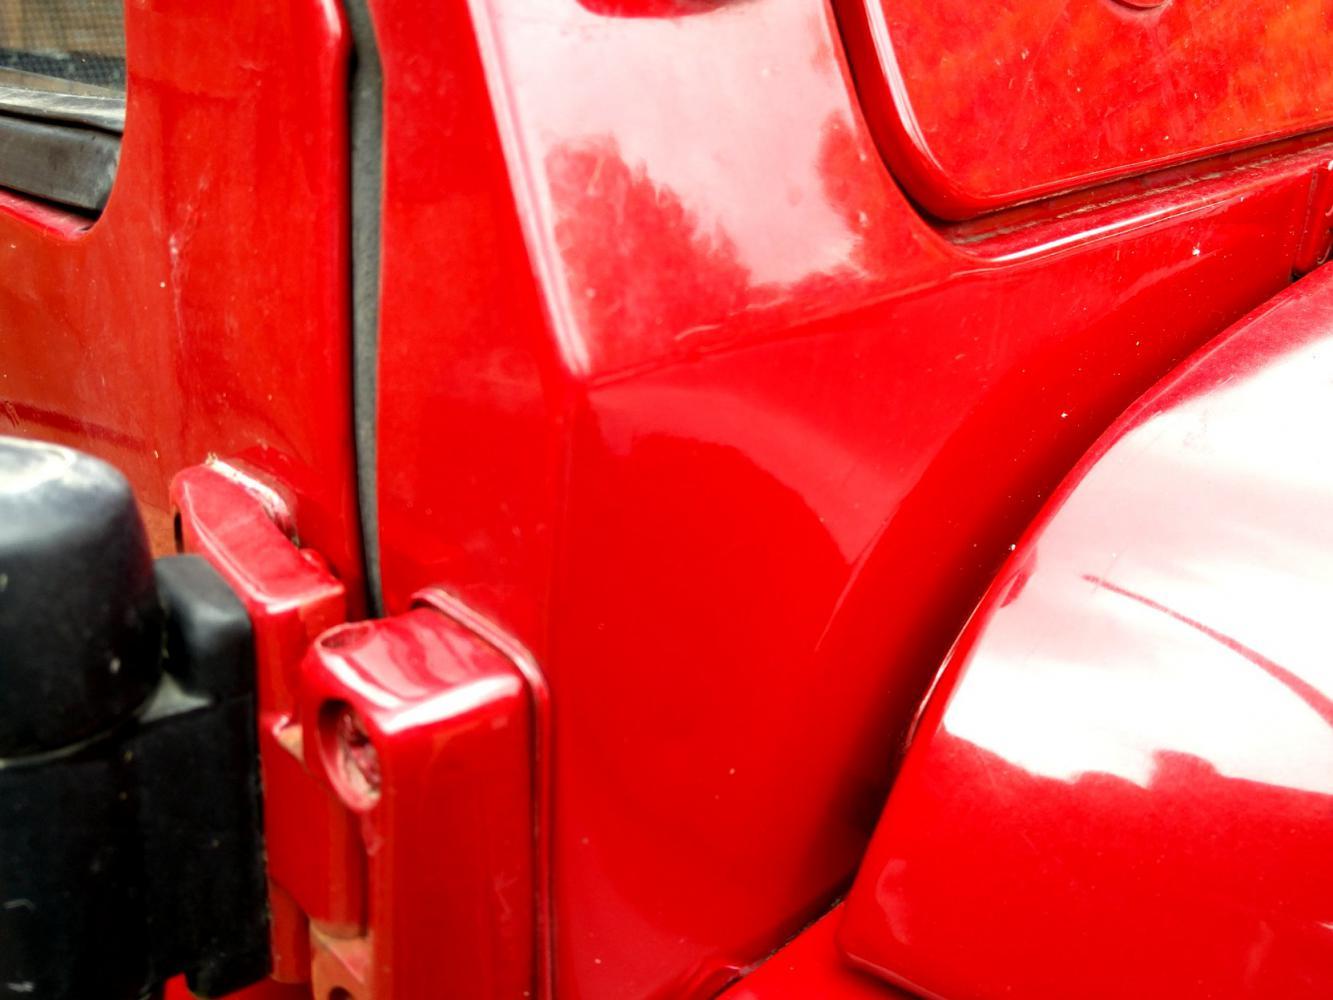 Click image for larger version  Name:1992 LR LHD Defender 90 Red 200 Tdi bulkhead corner RH.jpg Views:147 Size:101.4 KB ID:263730